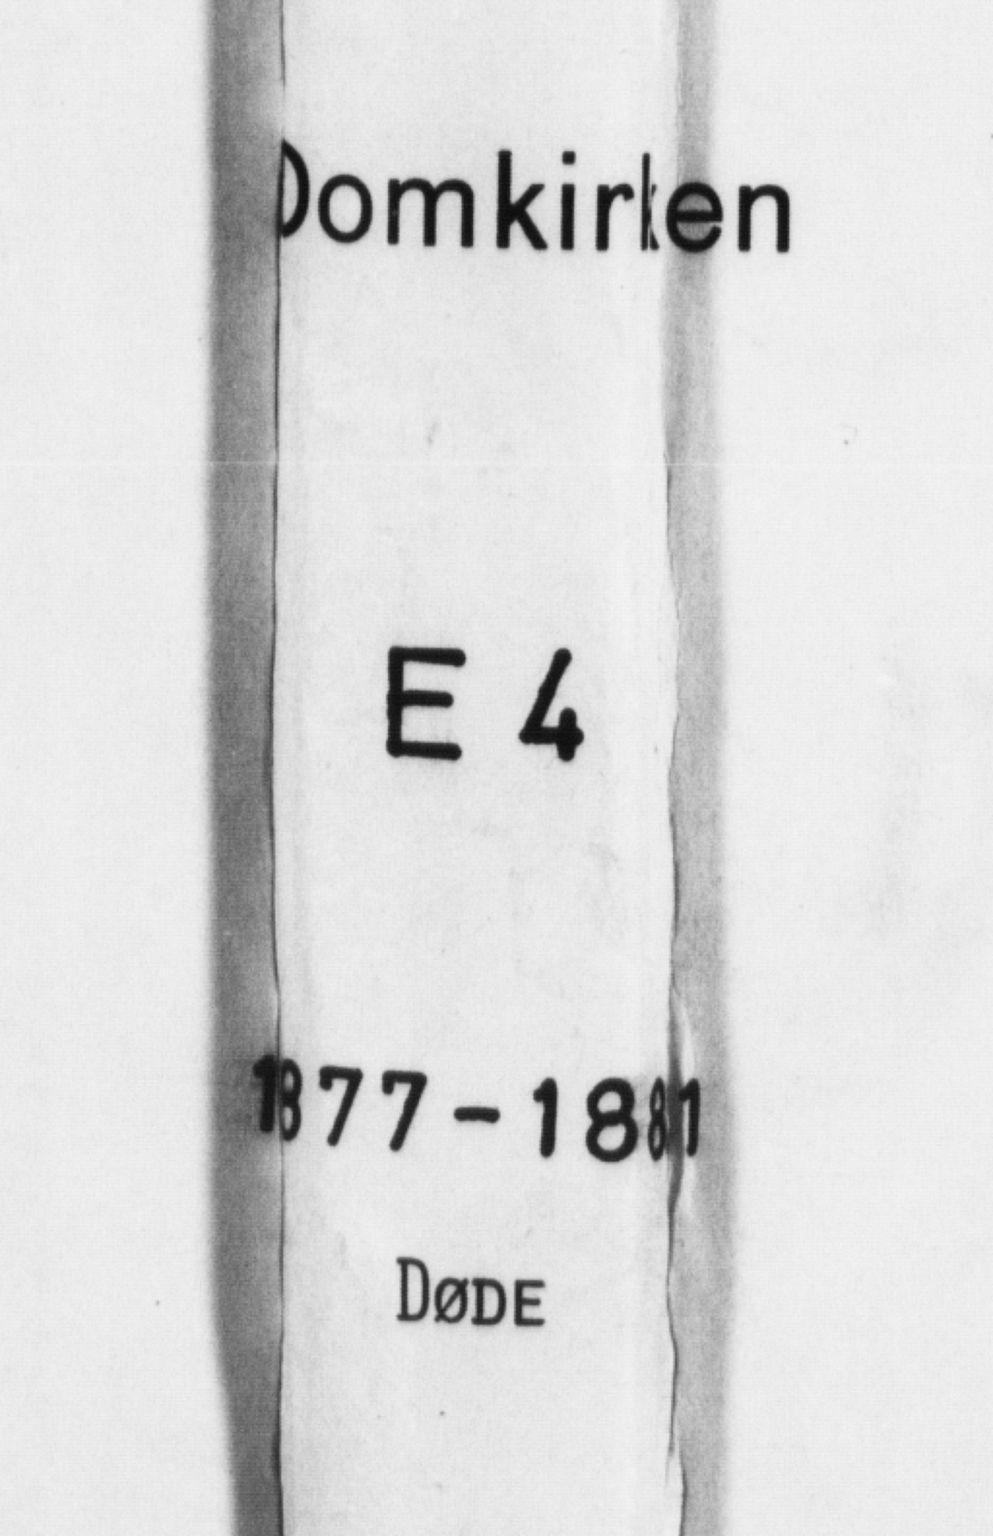 SAB, Domkirken Sokneprestembete, H/Haa: Ministerialbok nr. E 4, 1877-1881